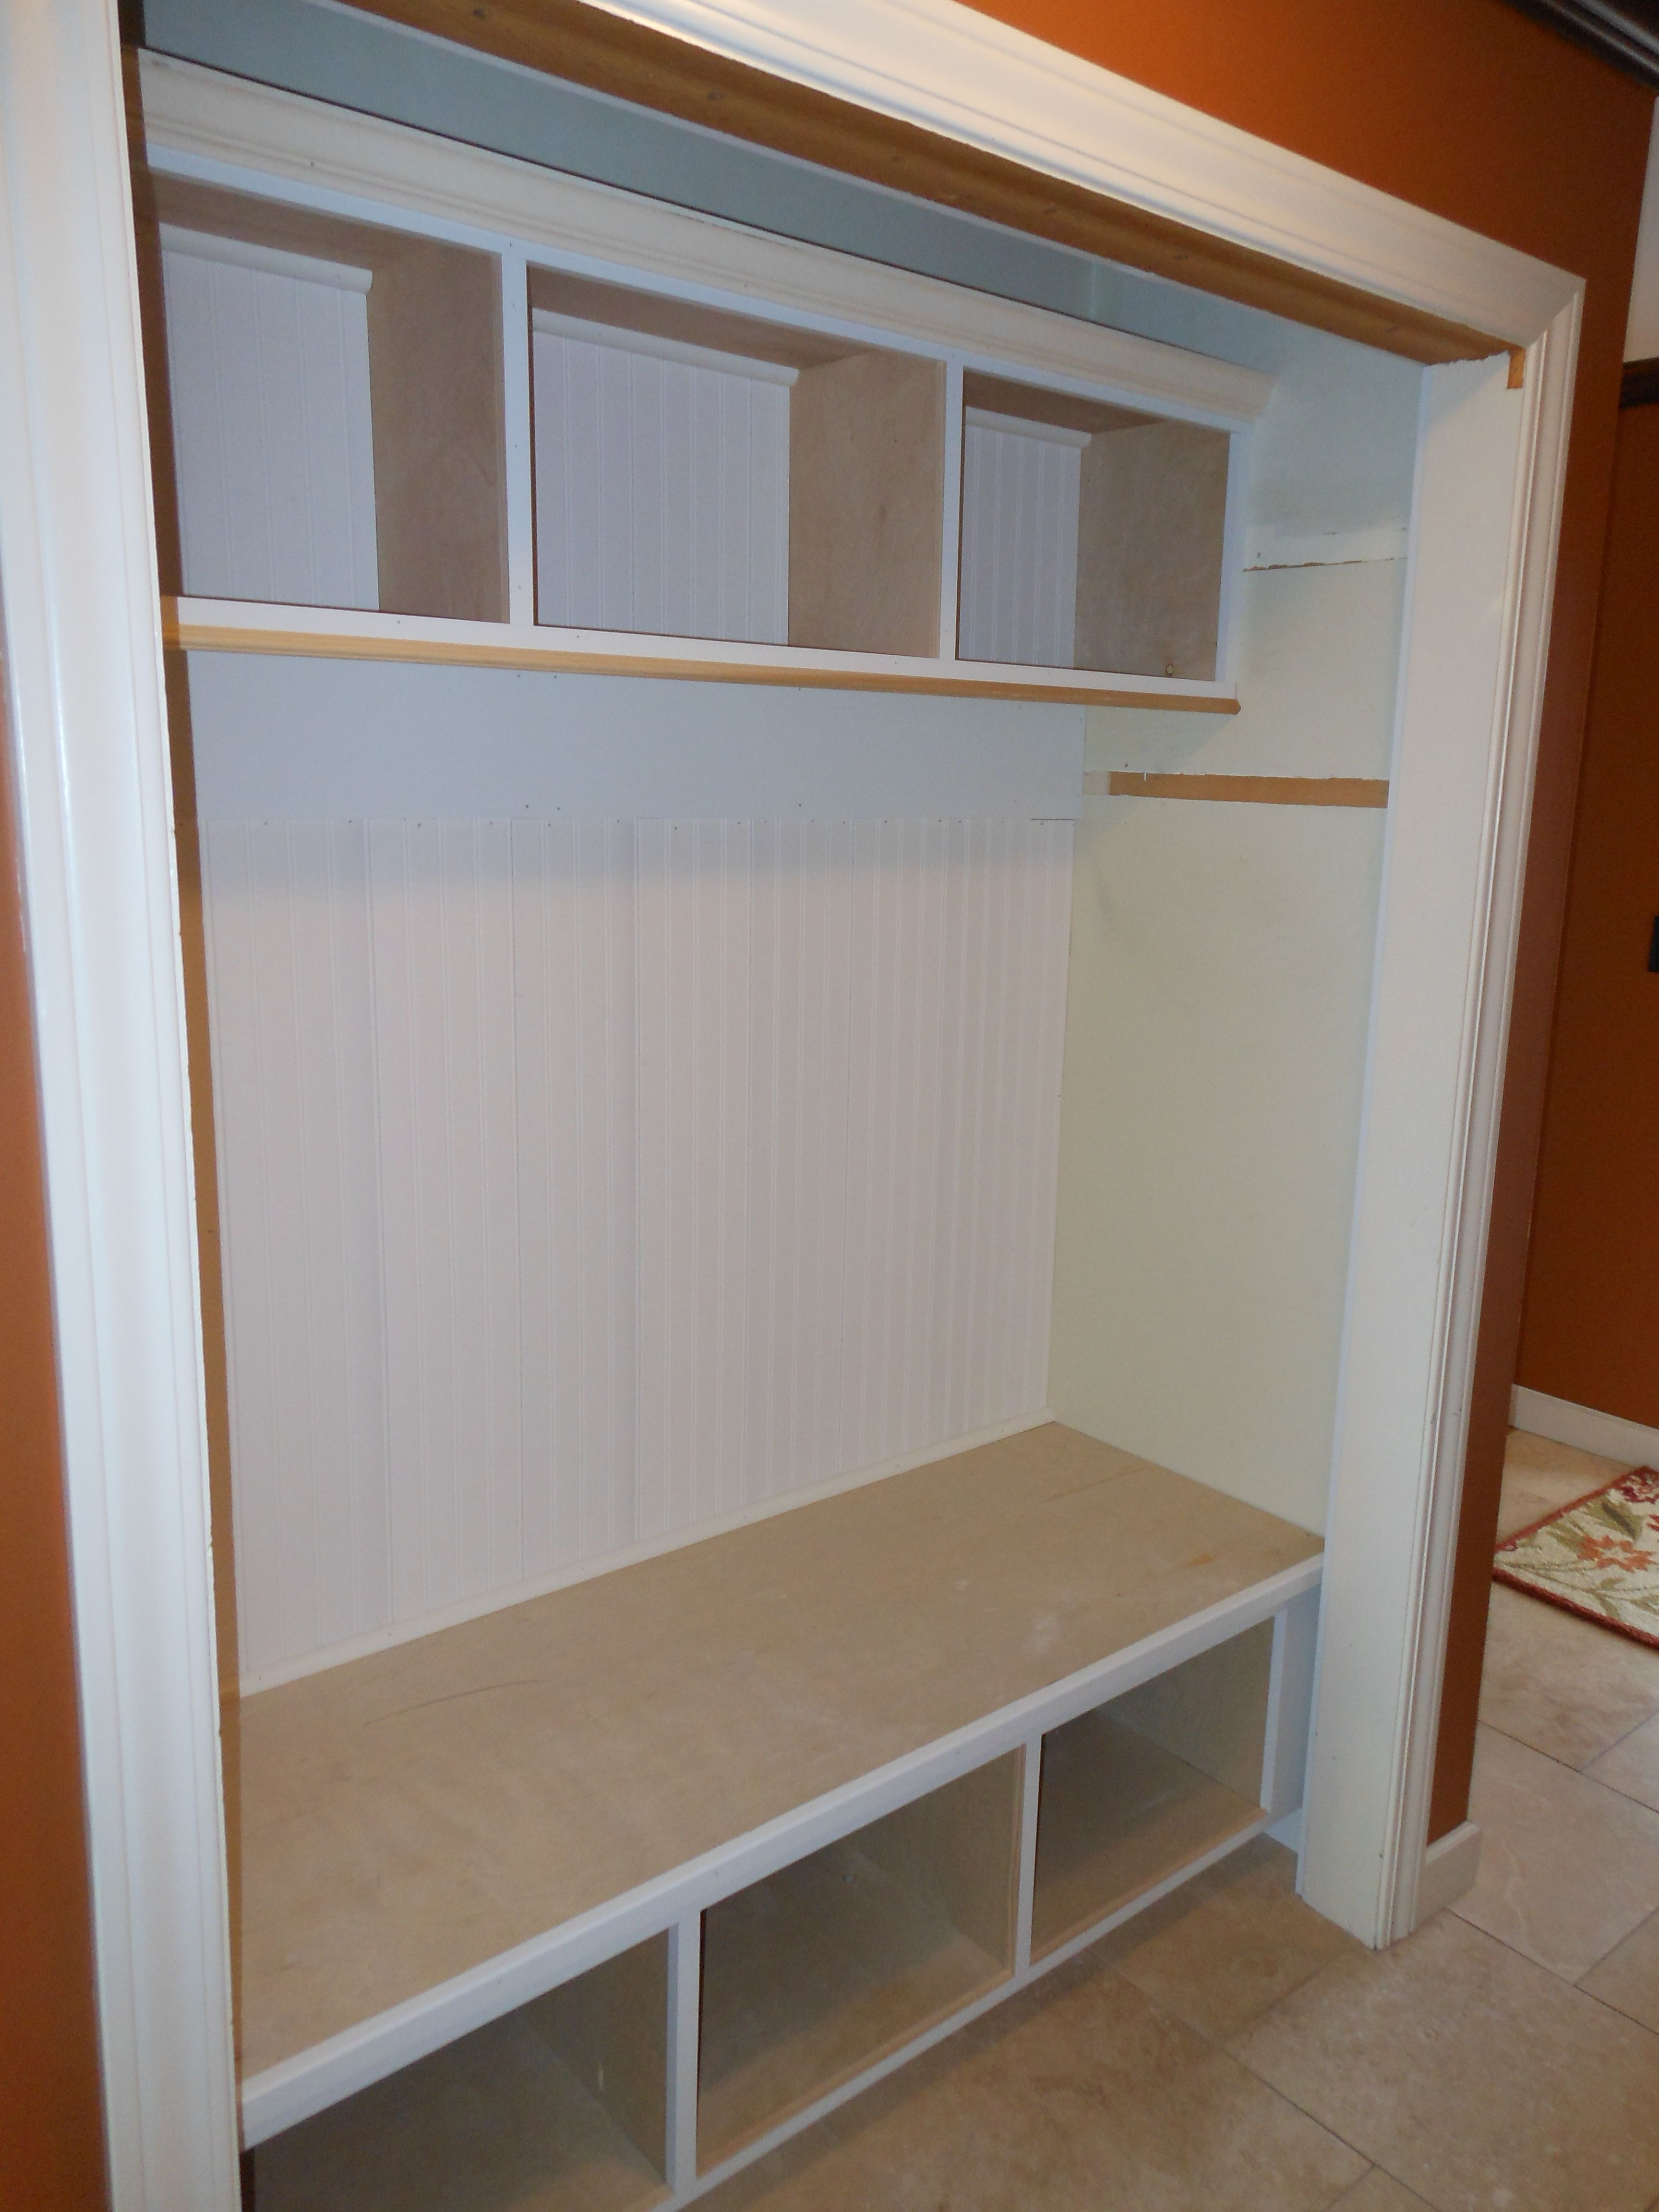 Hallway Closet Conversion: Again, Interesting Idea, But Removes A Lot Of  Hanging Storage.